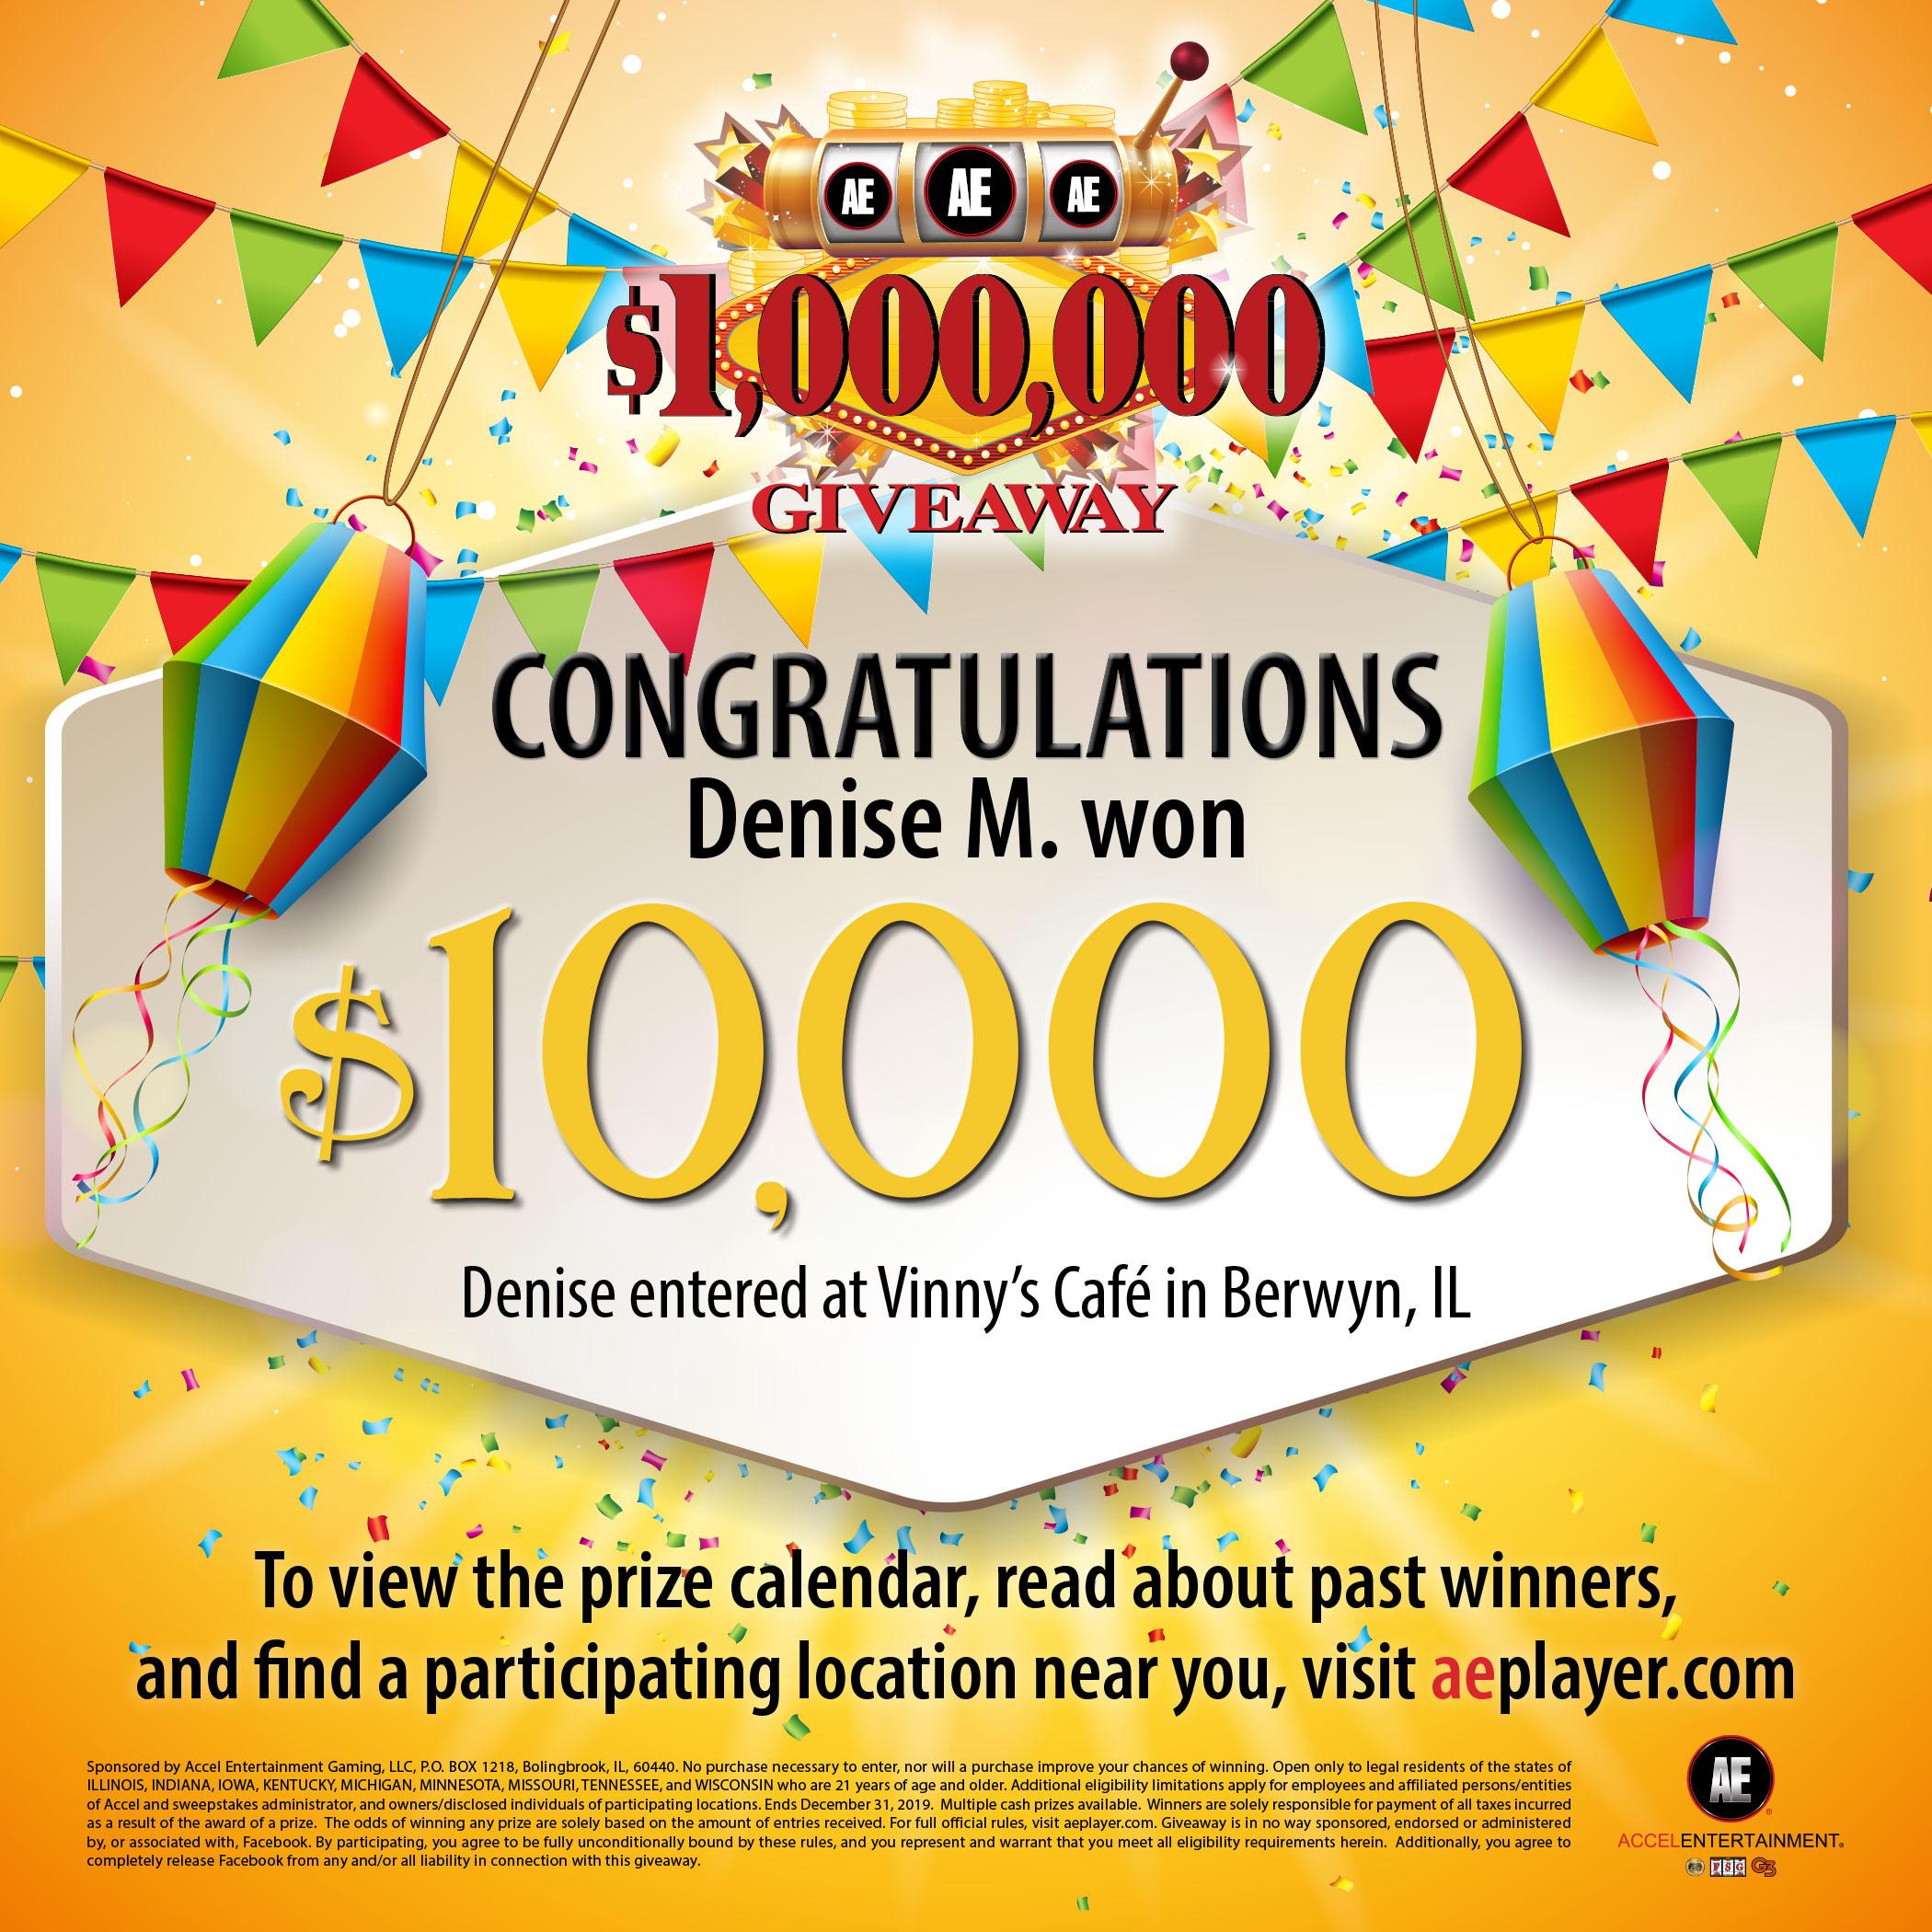 Wall of Winners | Million Dollar Giveaway